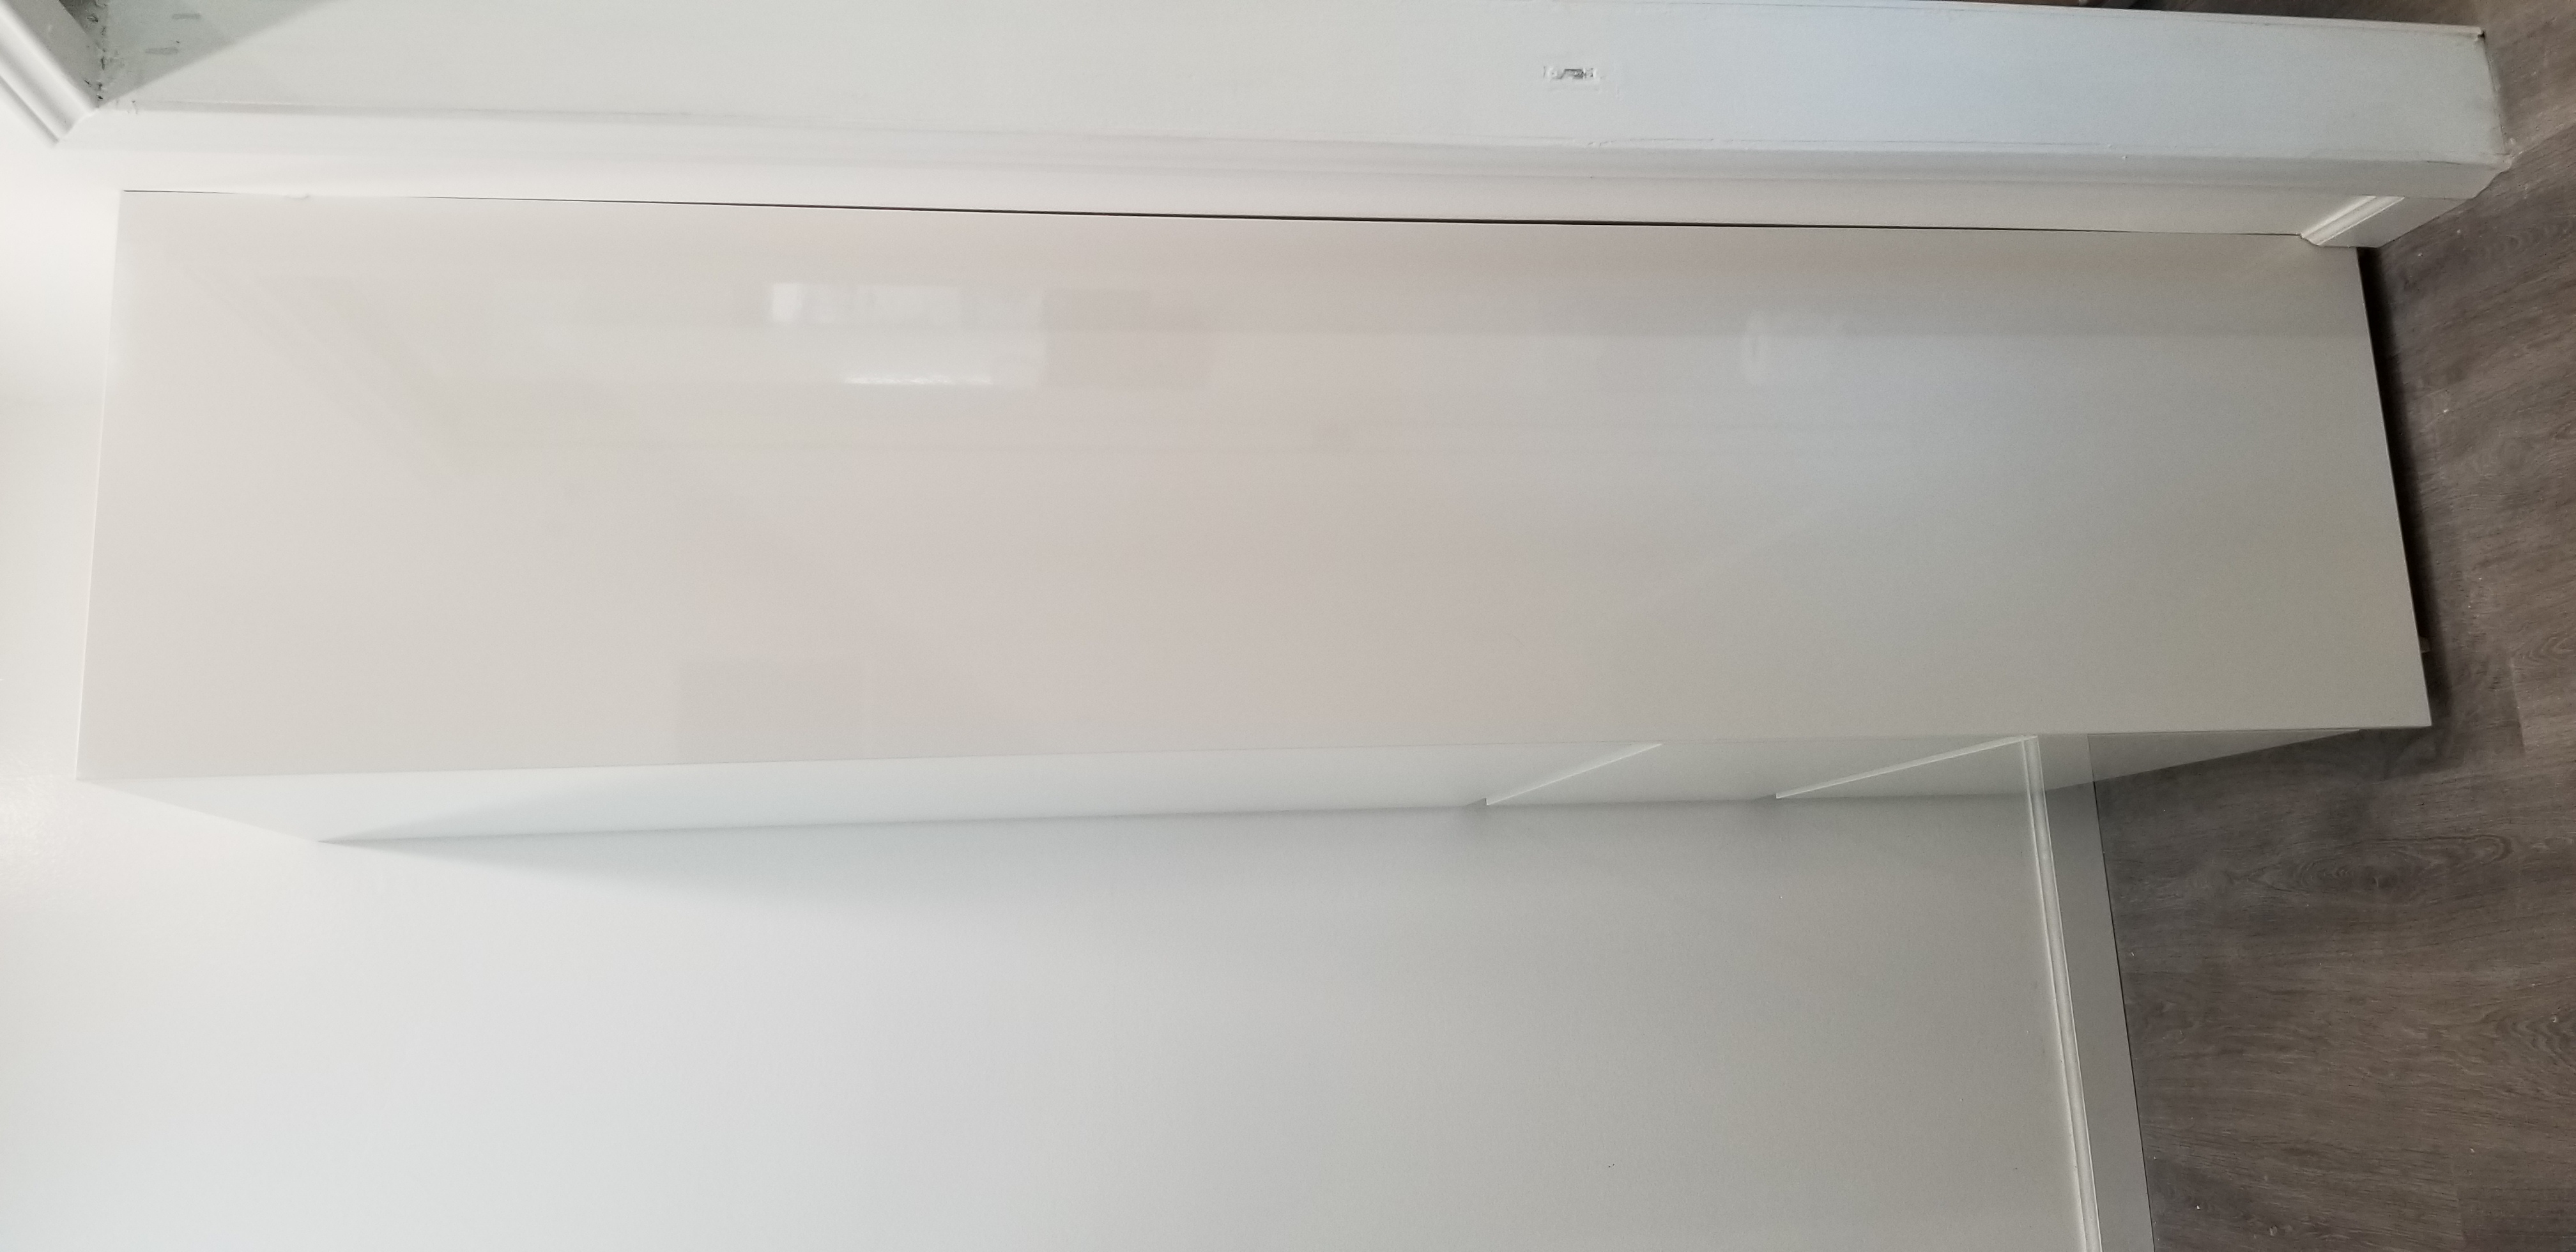 Customized bathroom vanities in Katy